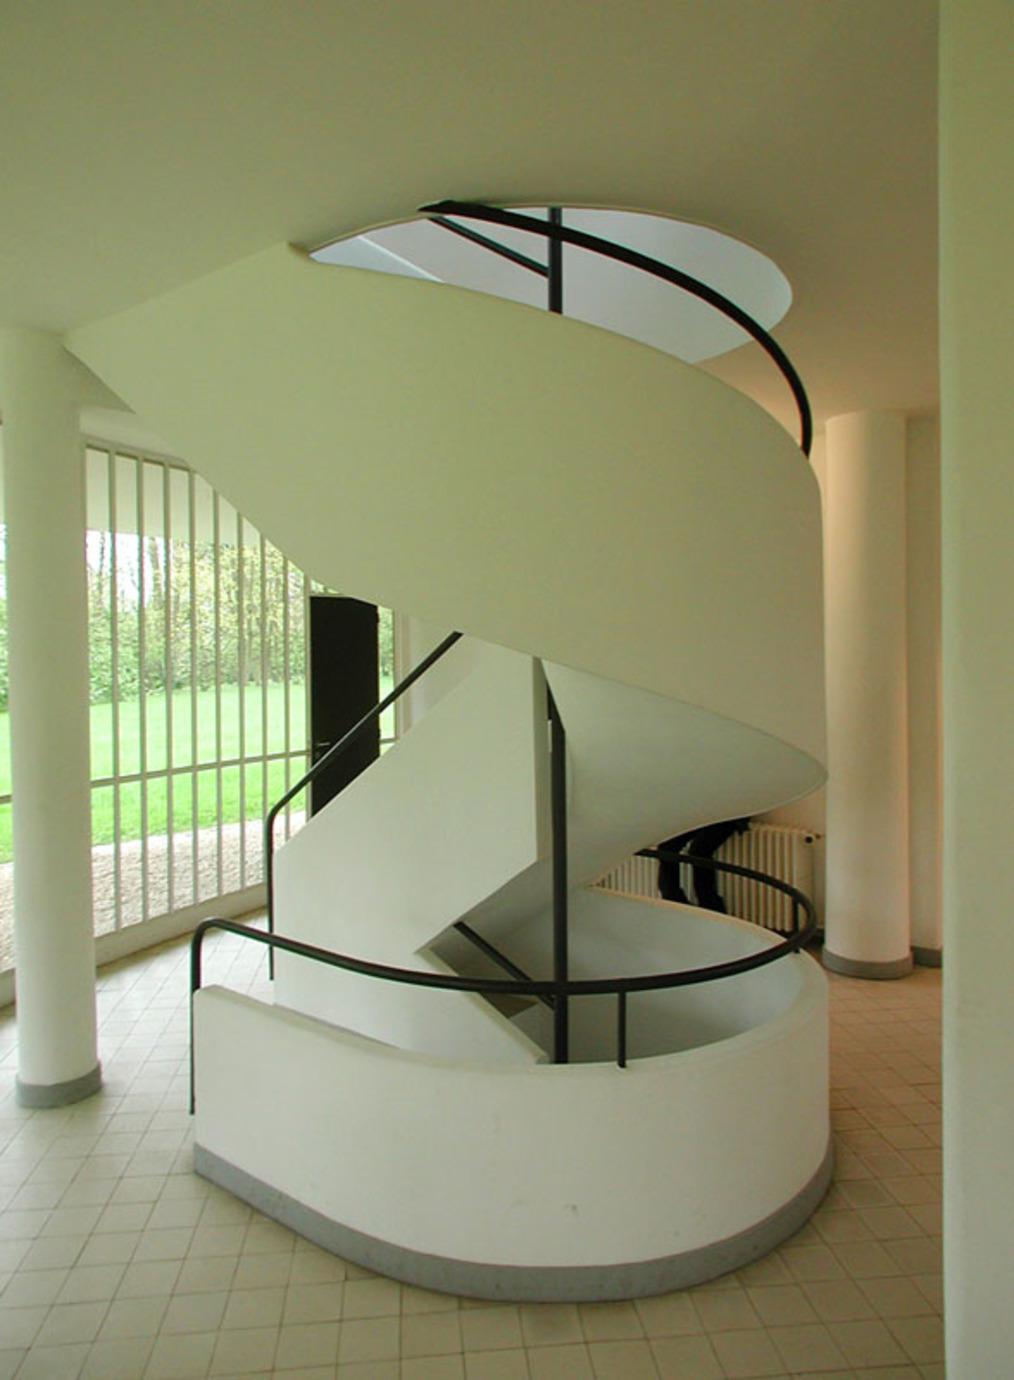 Bread pty ltd sublime design le corbusier 39 s villa savoye for 5 points corbusier